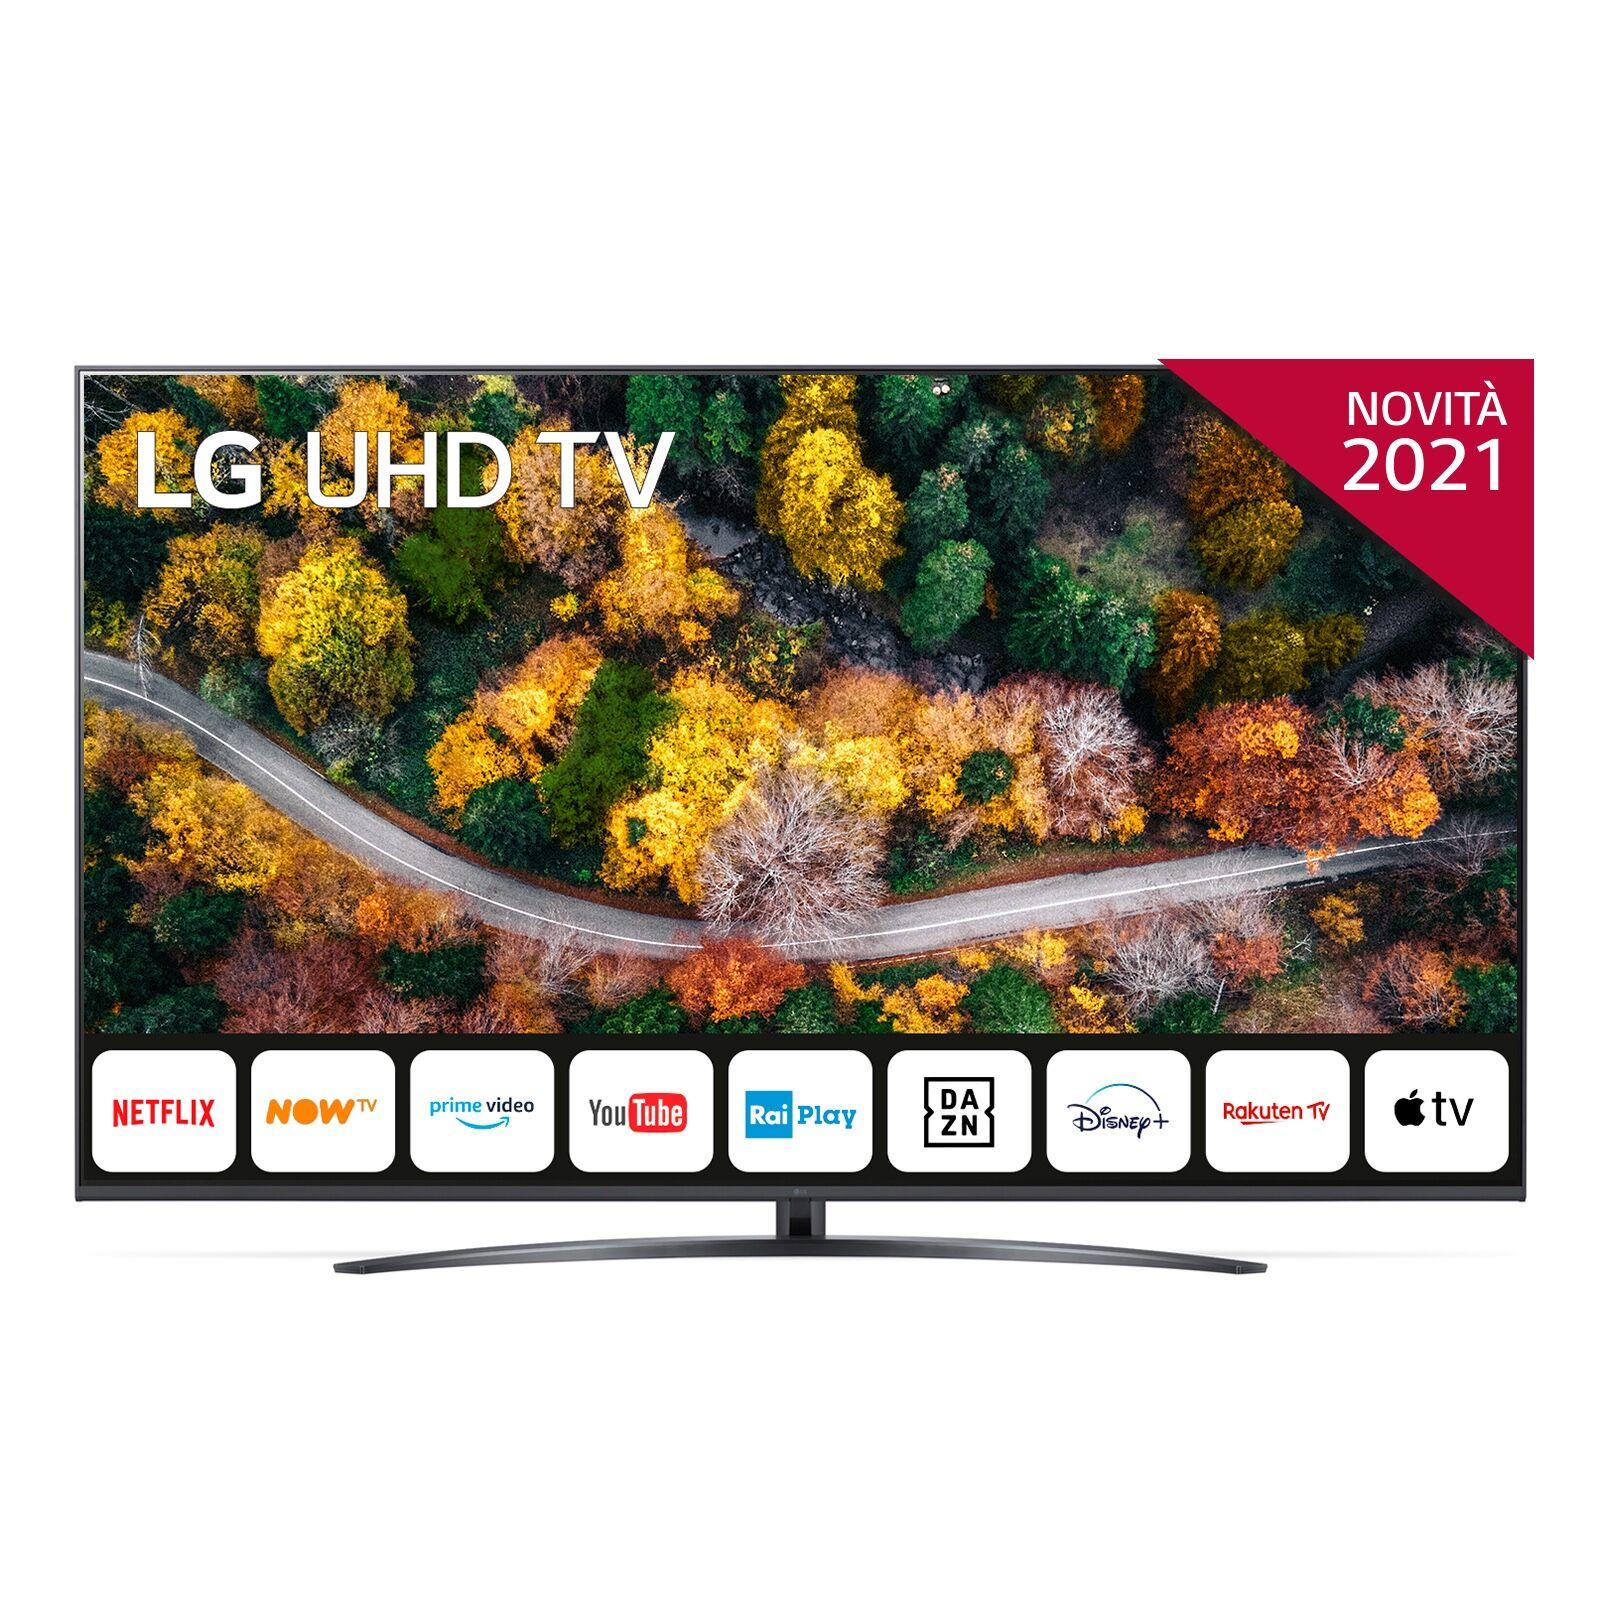 lg 55up78006lb 55 smart tv 4k ultra hd novitÀ 2021 wi-fi processore quad core 4k ai sound